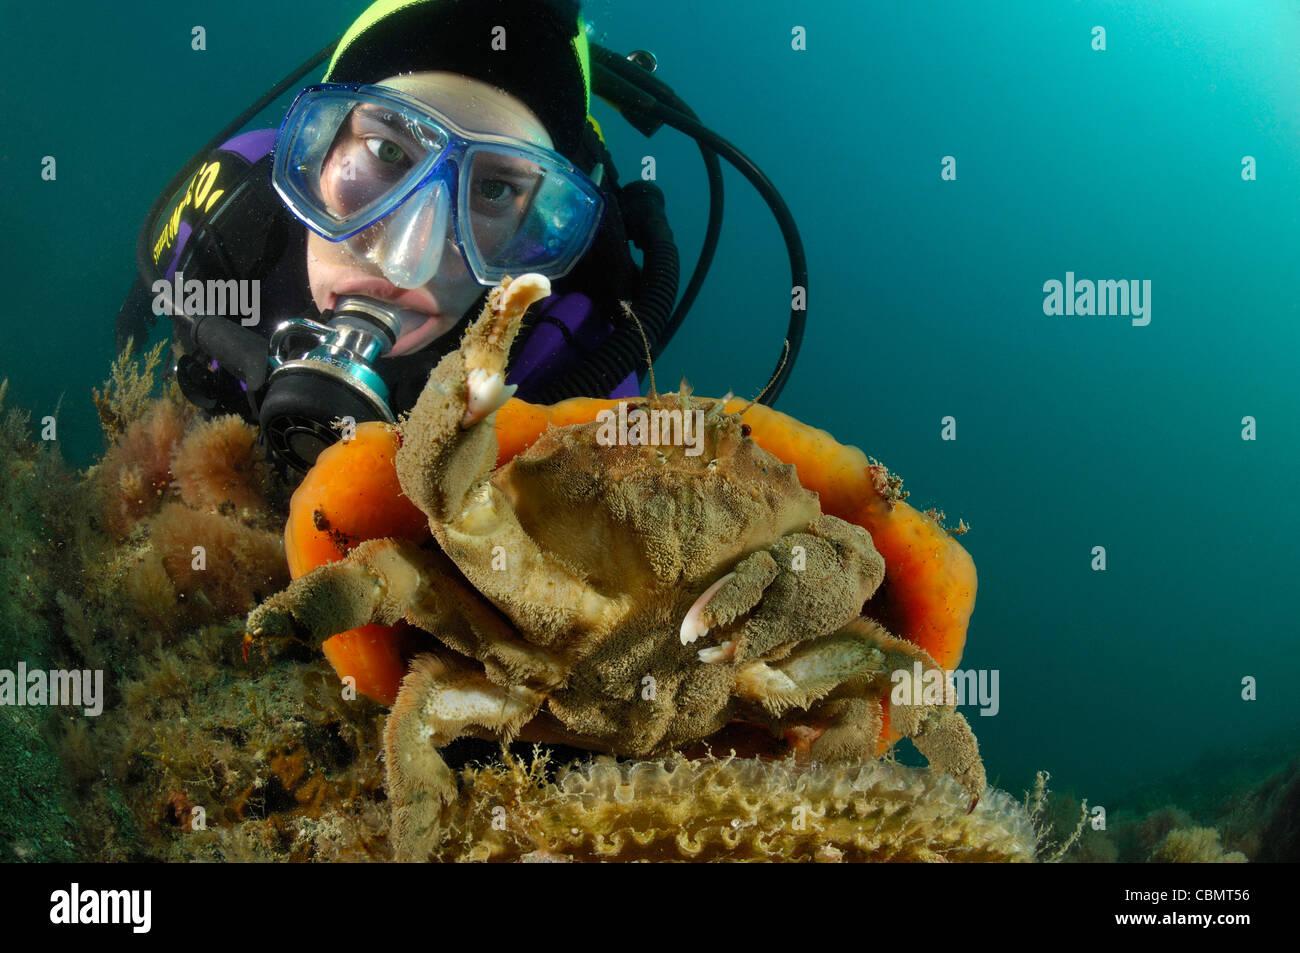 Crabe éponge éponge orange report, Dromia personata, Piran, Slovénie, la mer Adriatique Photo Stock